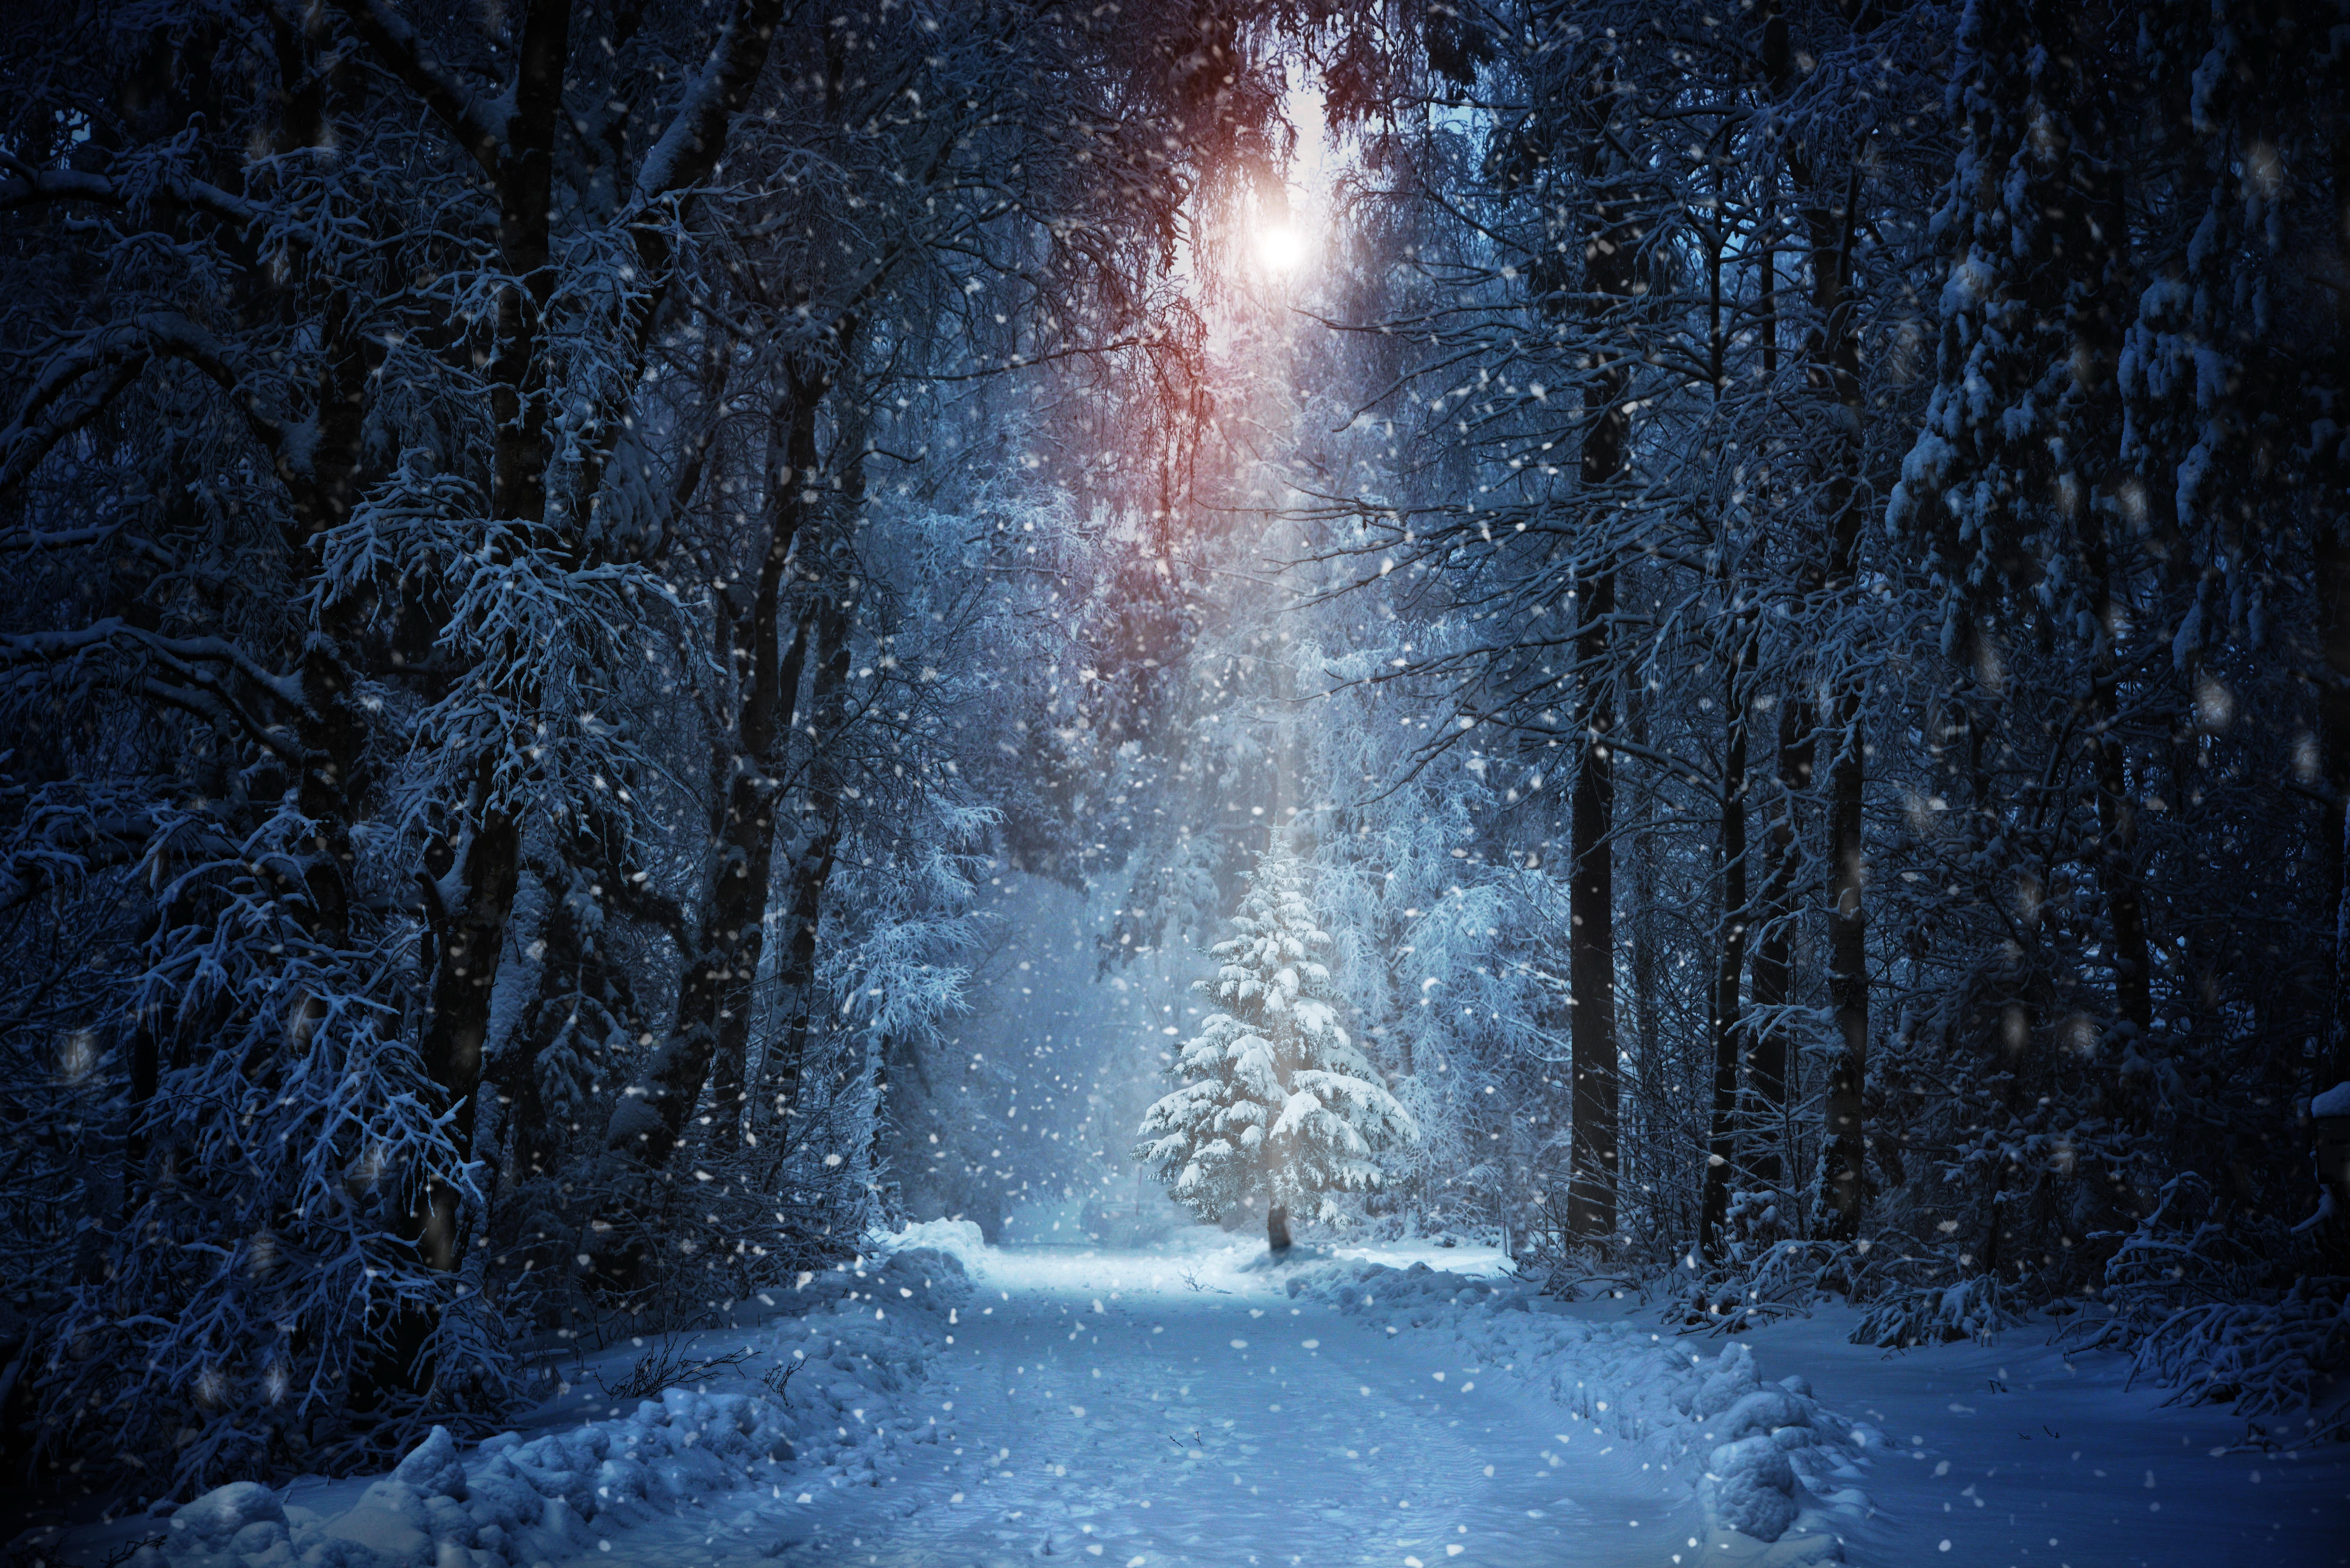 Snow Wallpaper 4k 8000x5339 Wallpaper Teahub Io